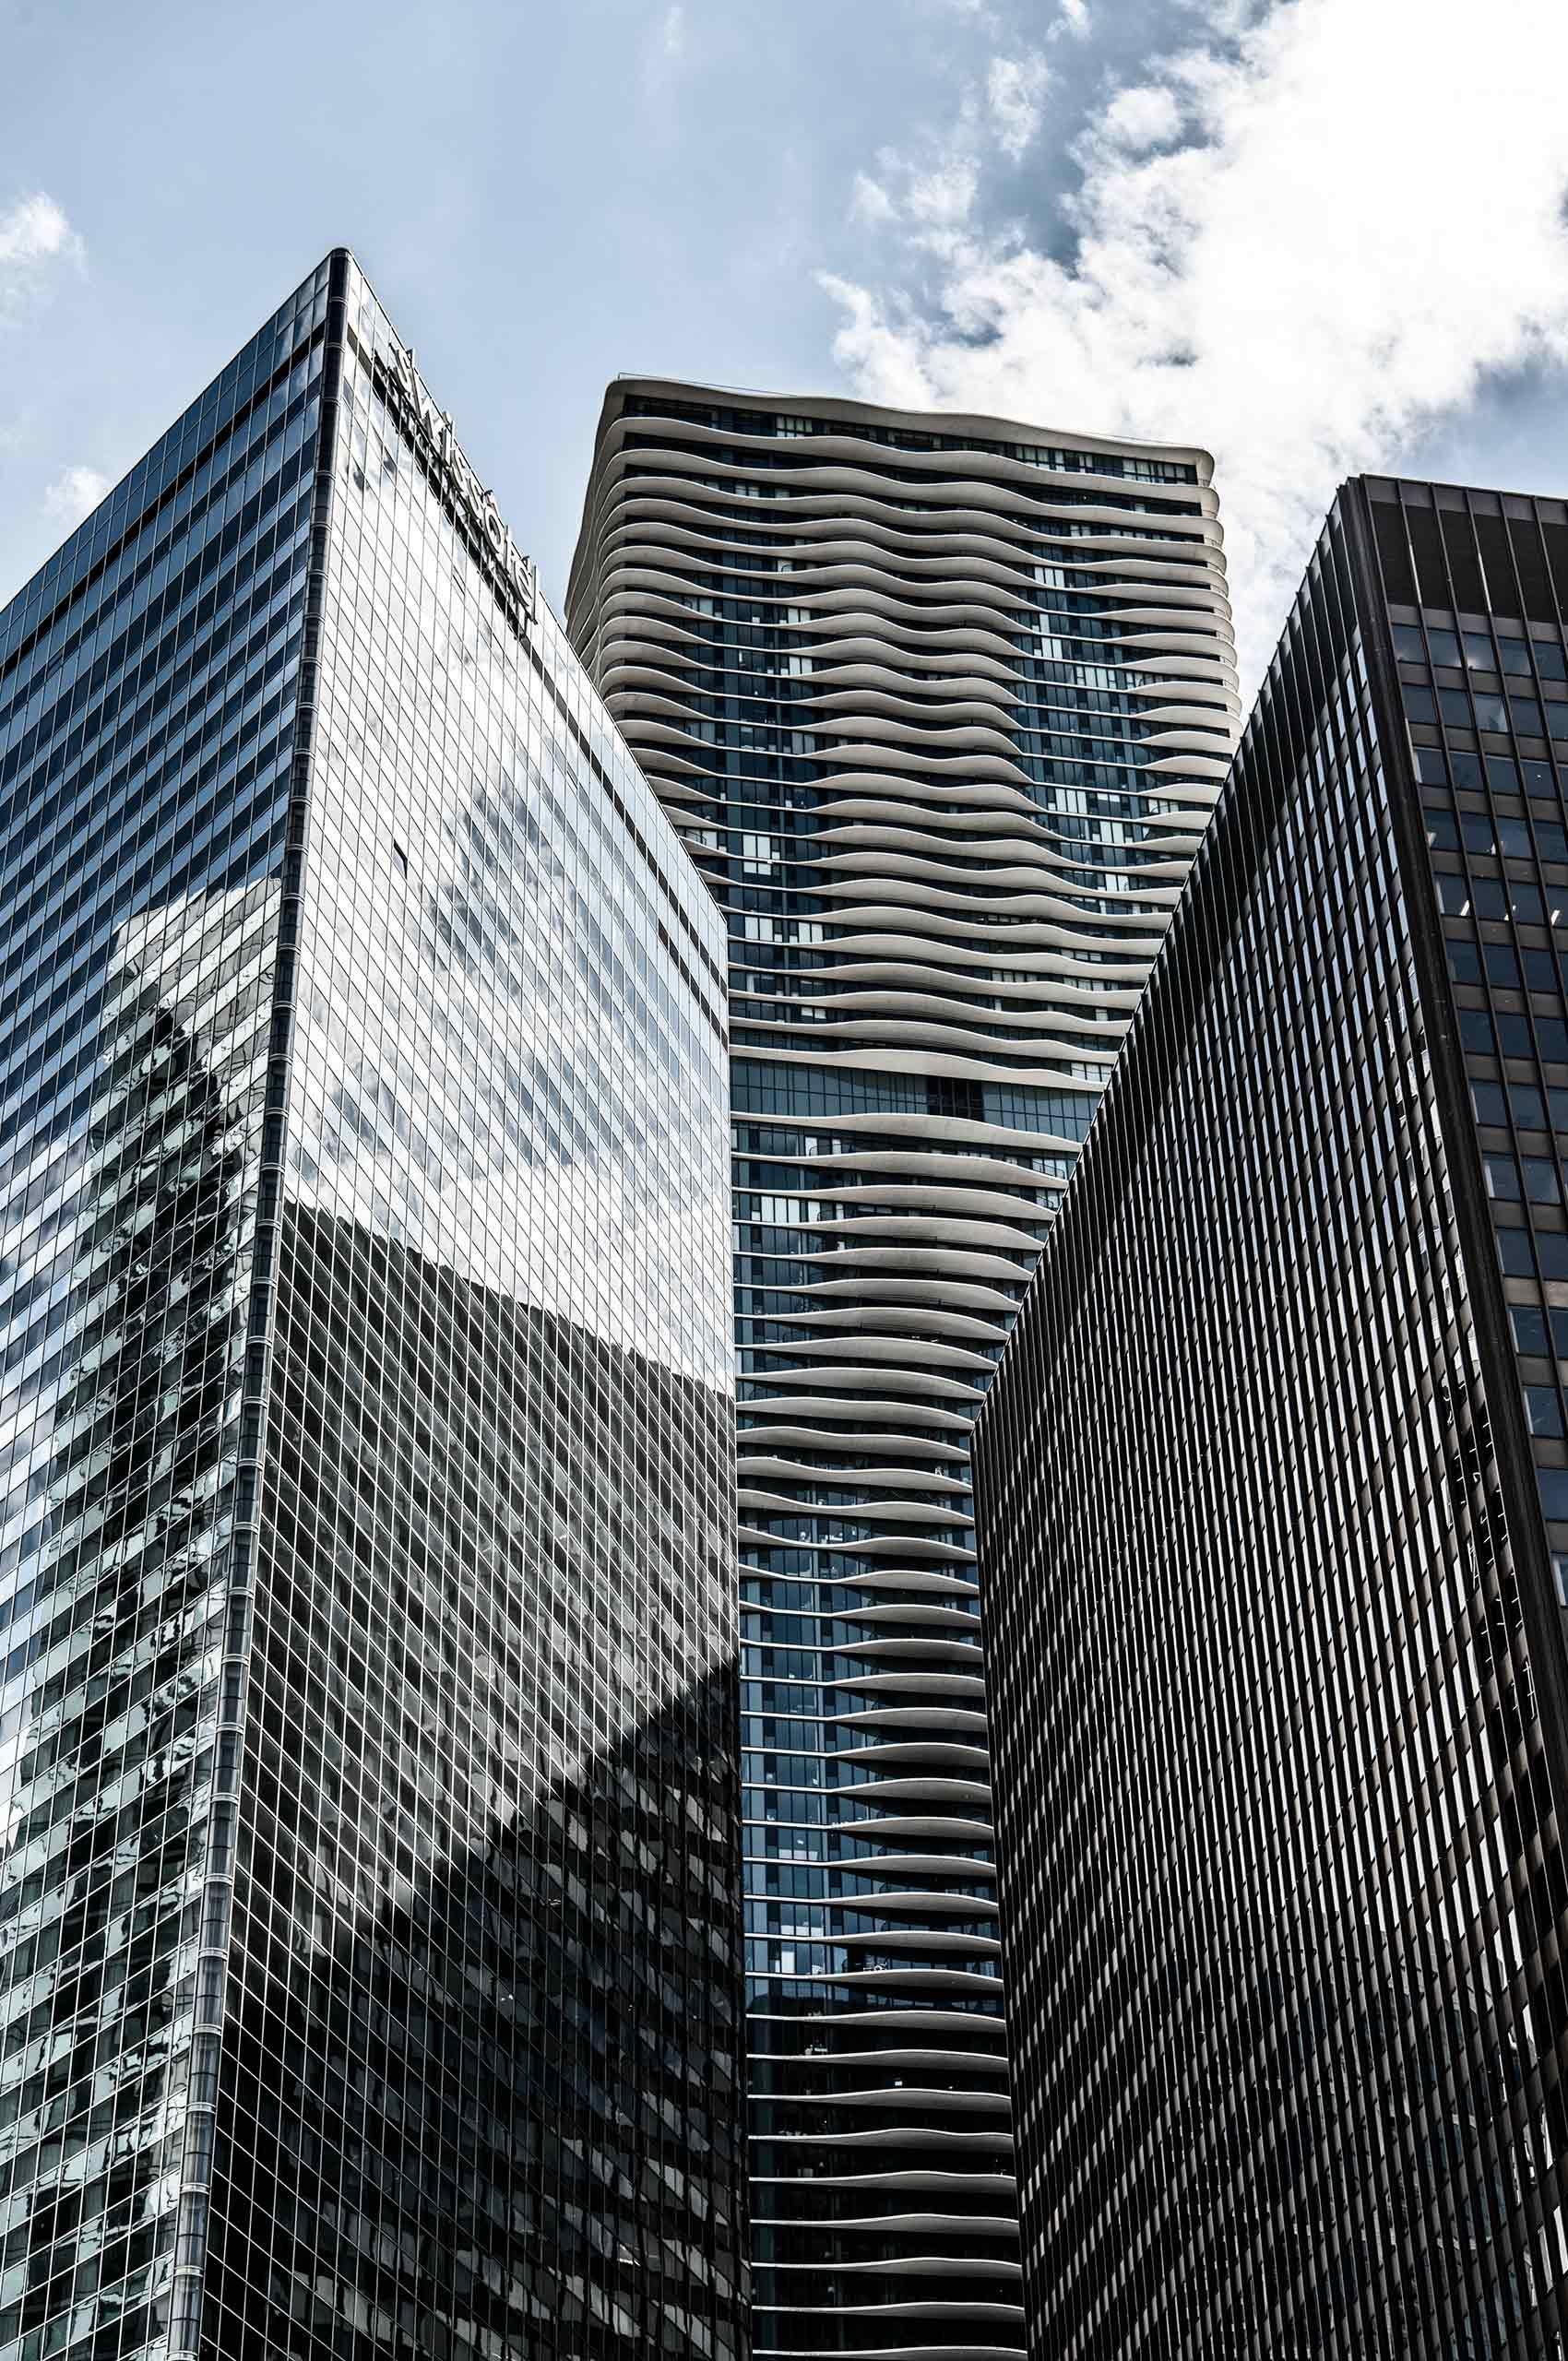 Contemporary-Skyscrapers-Chicago-by-HenrikOlundPhotography.jpg